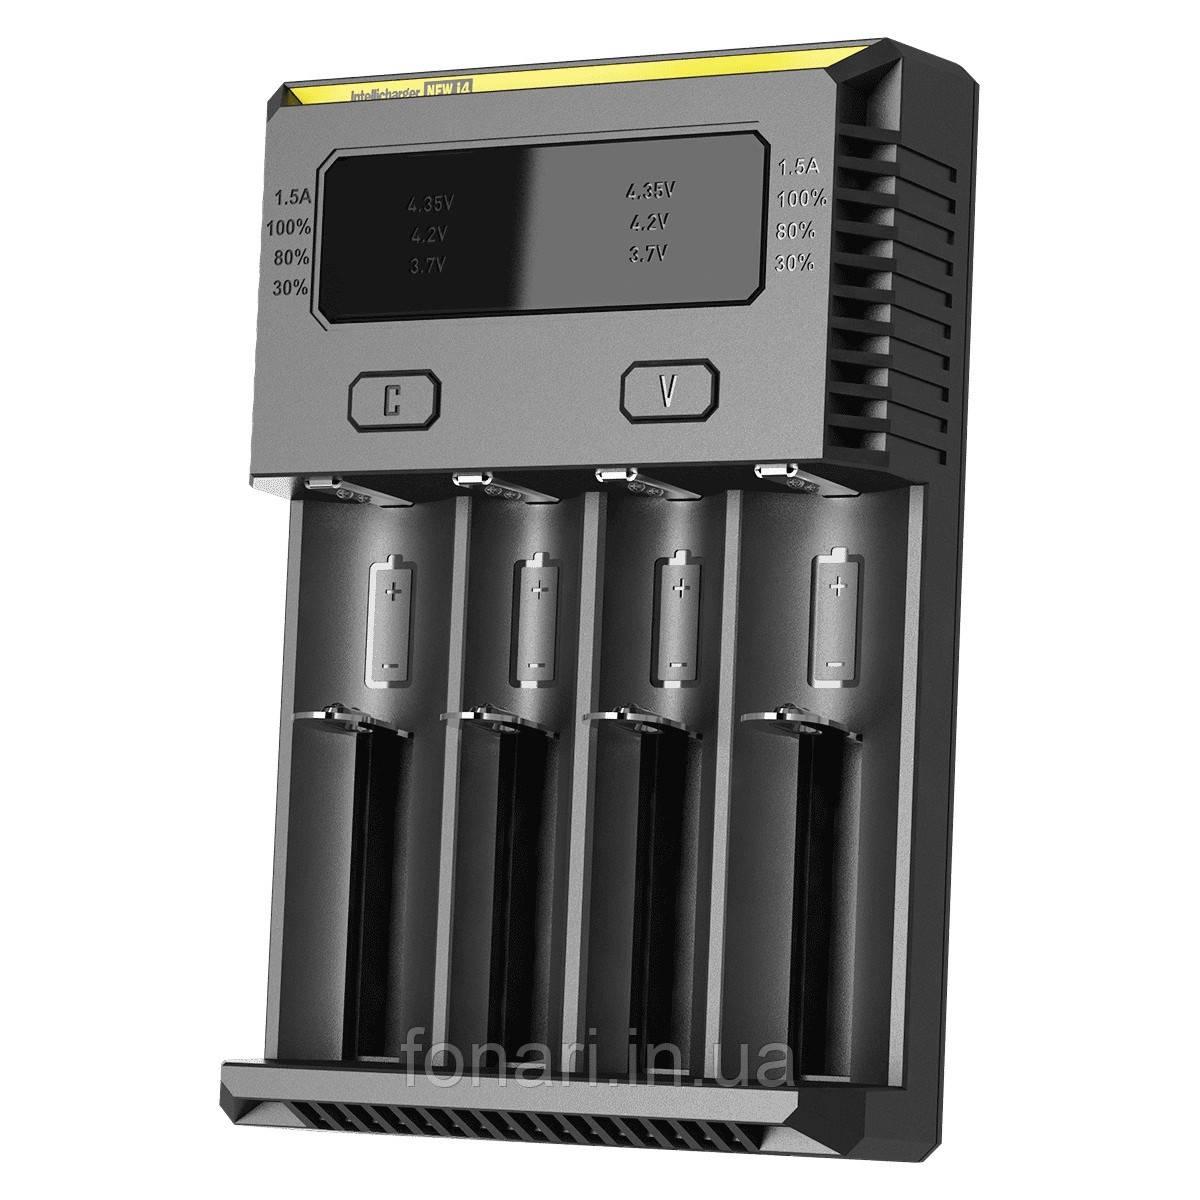 Nitecore Intellicharger i4 NEW - Зарядное устройство  для Li-Ion/Ni-Mh (Оригинал)